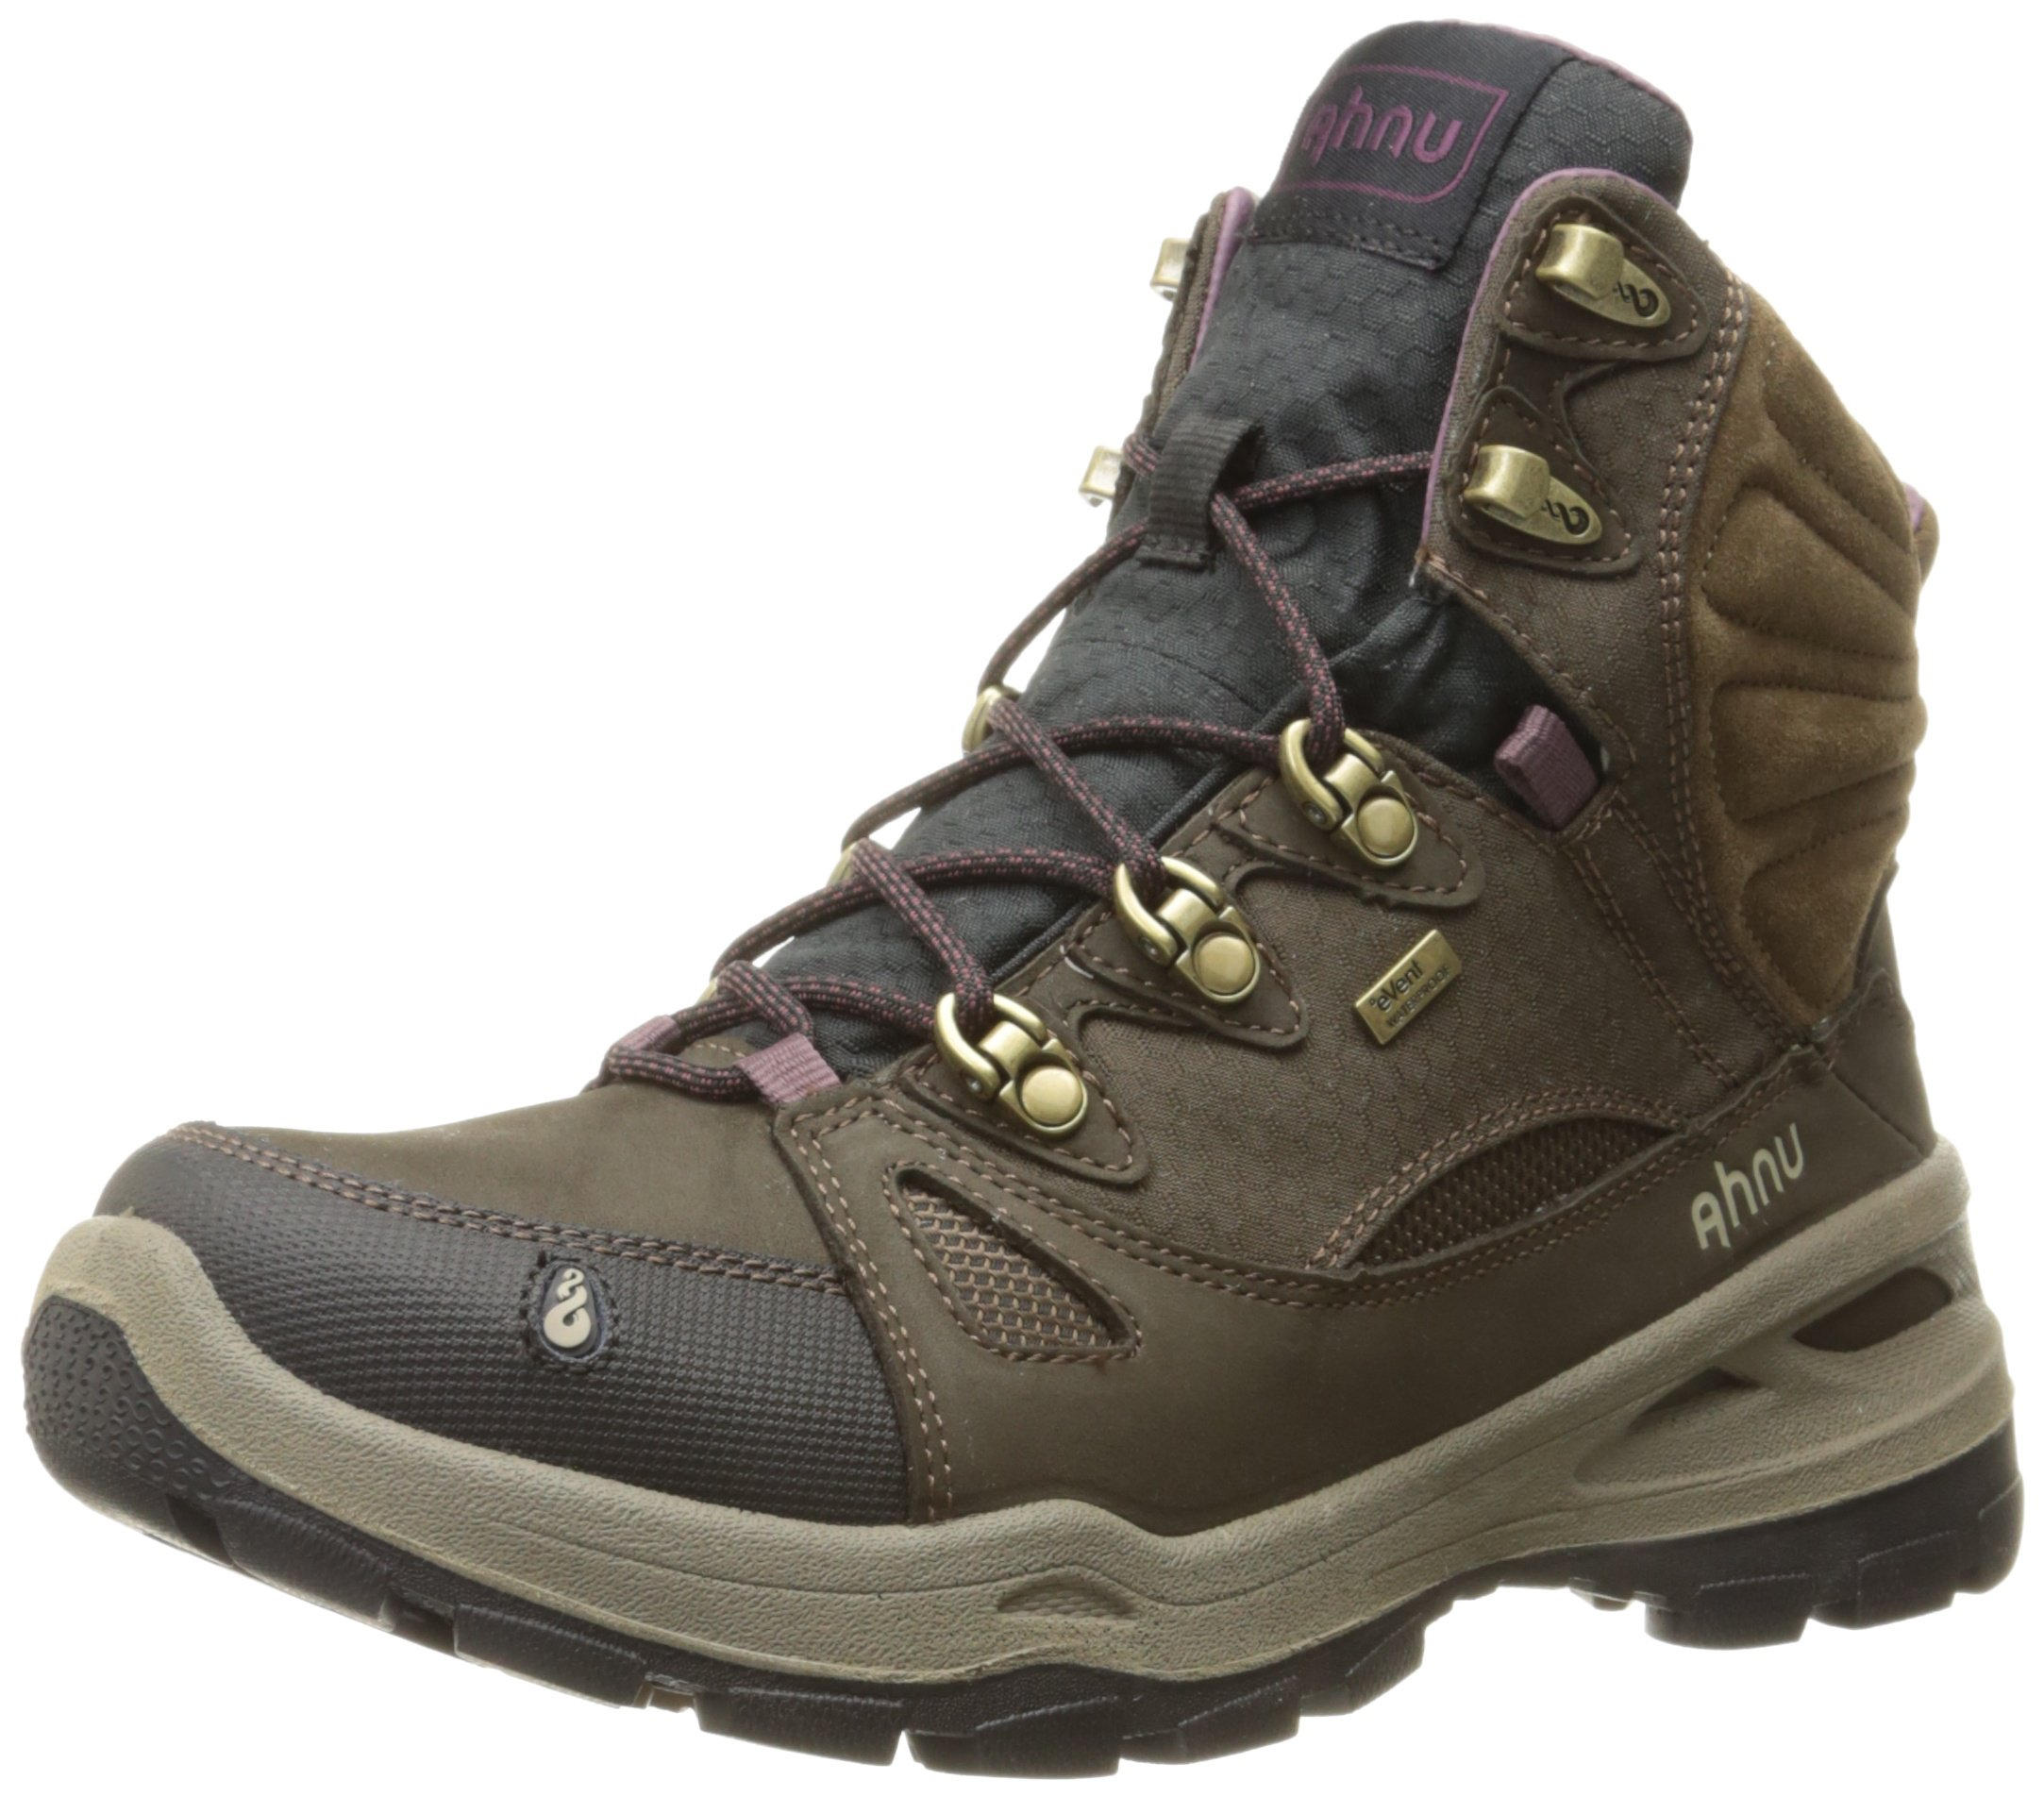 Ahnu Women's North Peak eVent Backpacking Boot, Smokey Brown, 8.5 M US